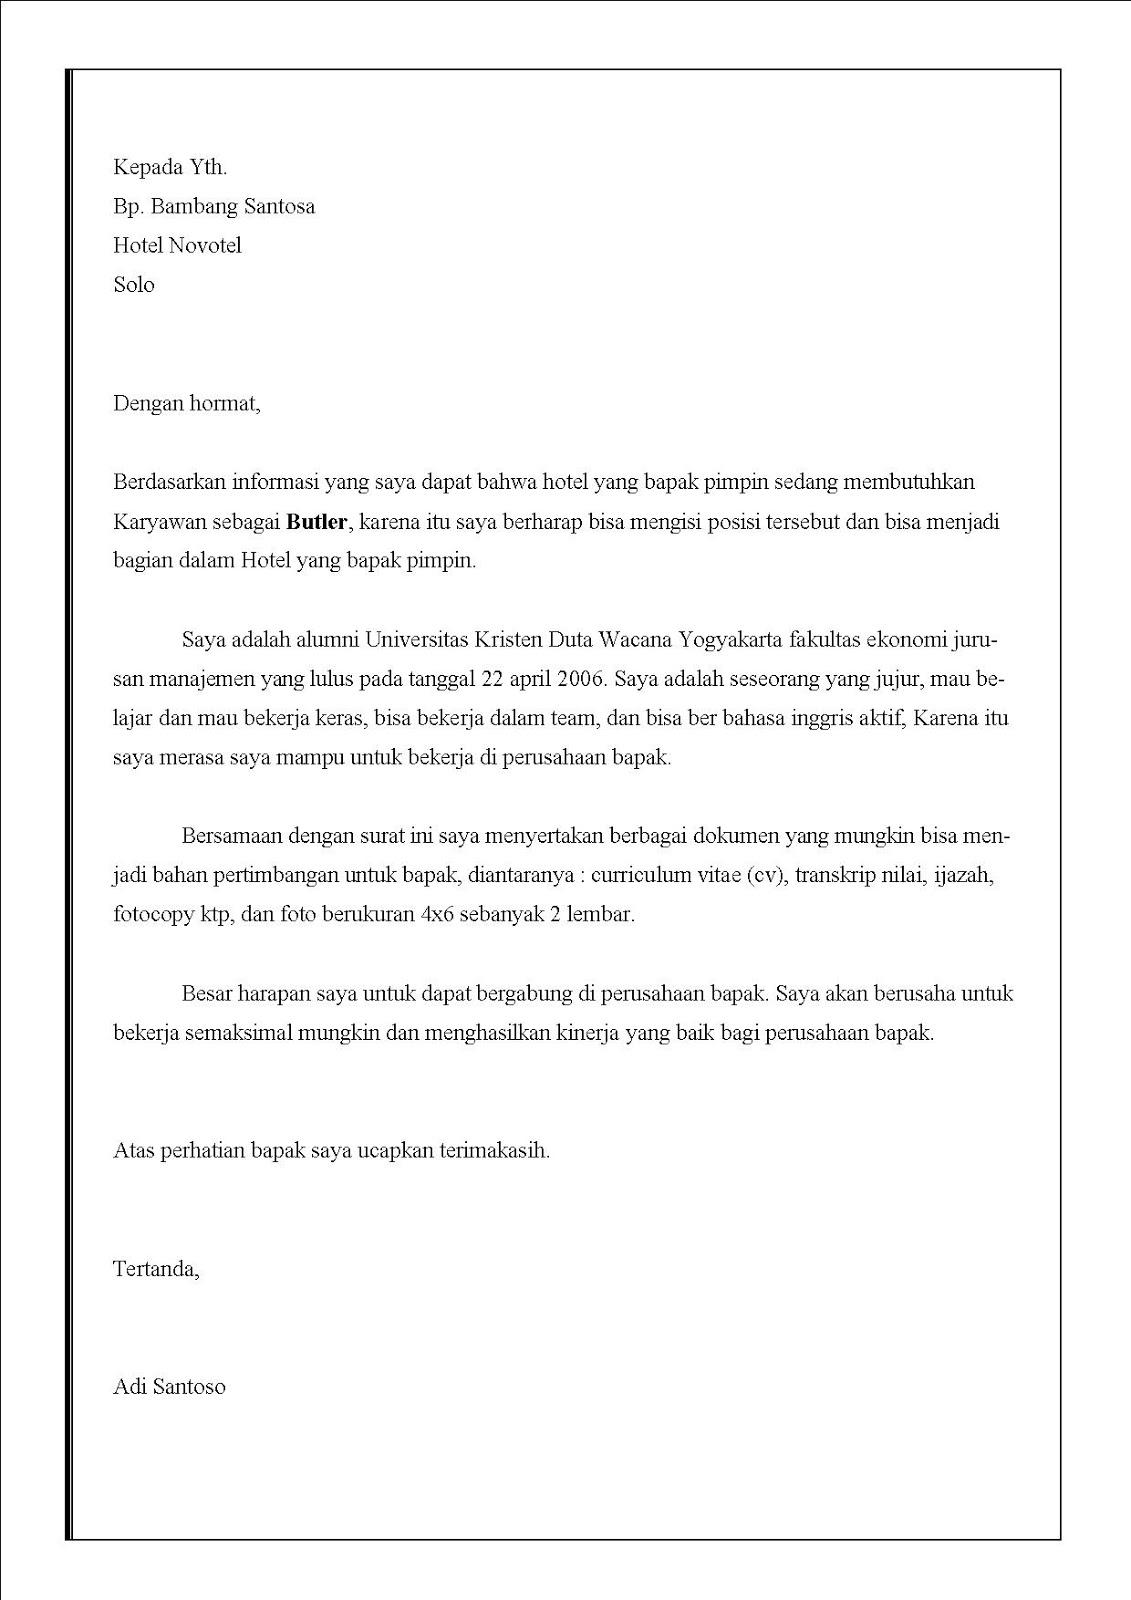 Contoh surat lamaran kerja di hotel Sebagai butler